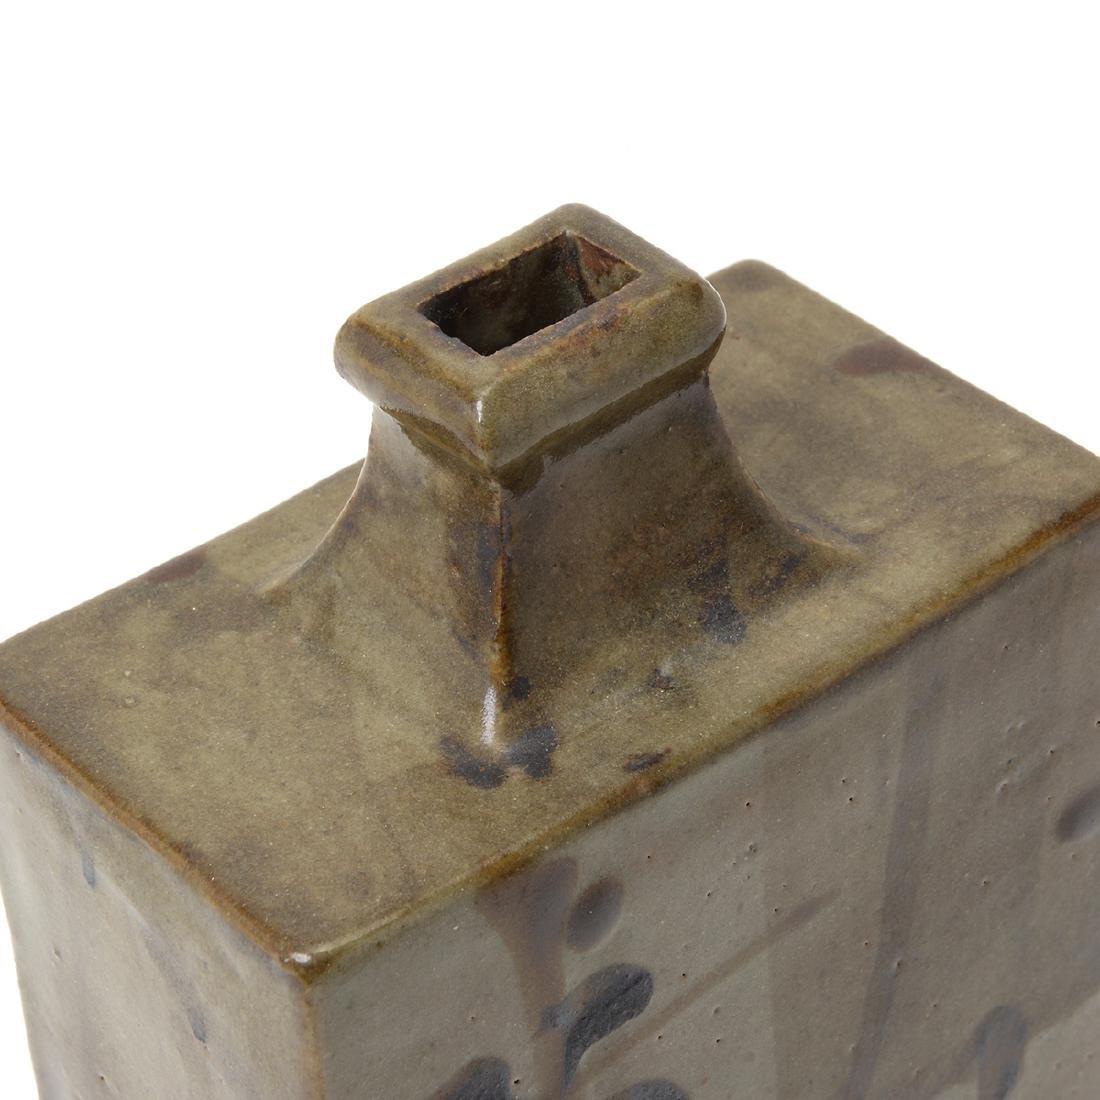 Japanese Glazed Ceramic Square Bottle Vase - 6